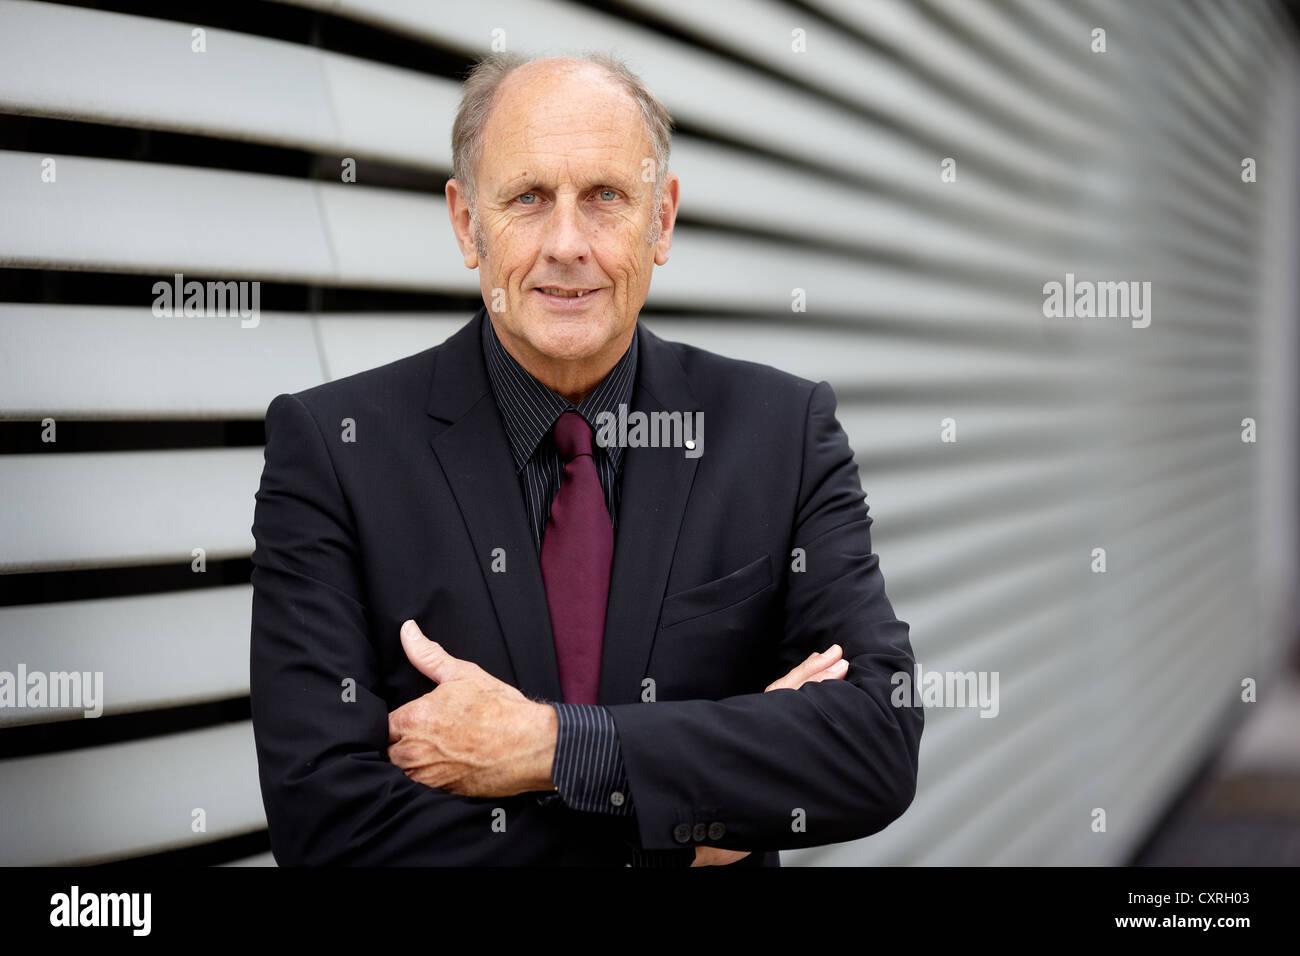 Hans-Joachim Stuck, racing driver, Frankfurt am Main, Hesse, Germany, Europe - Stock Image